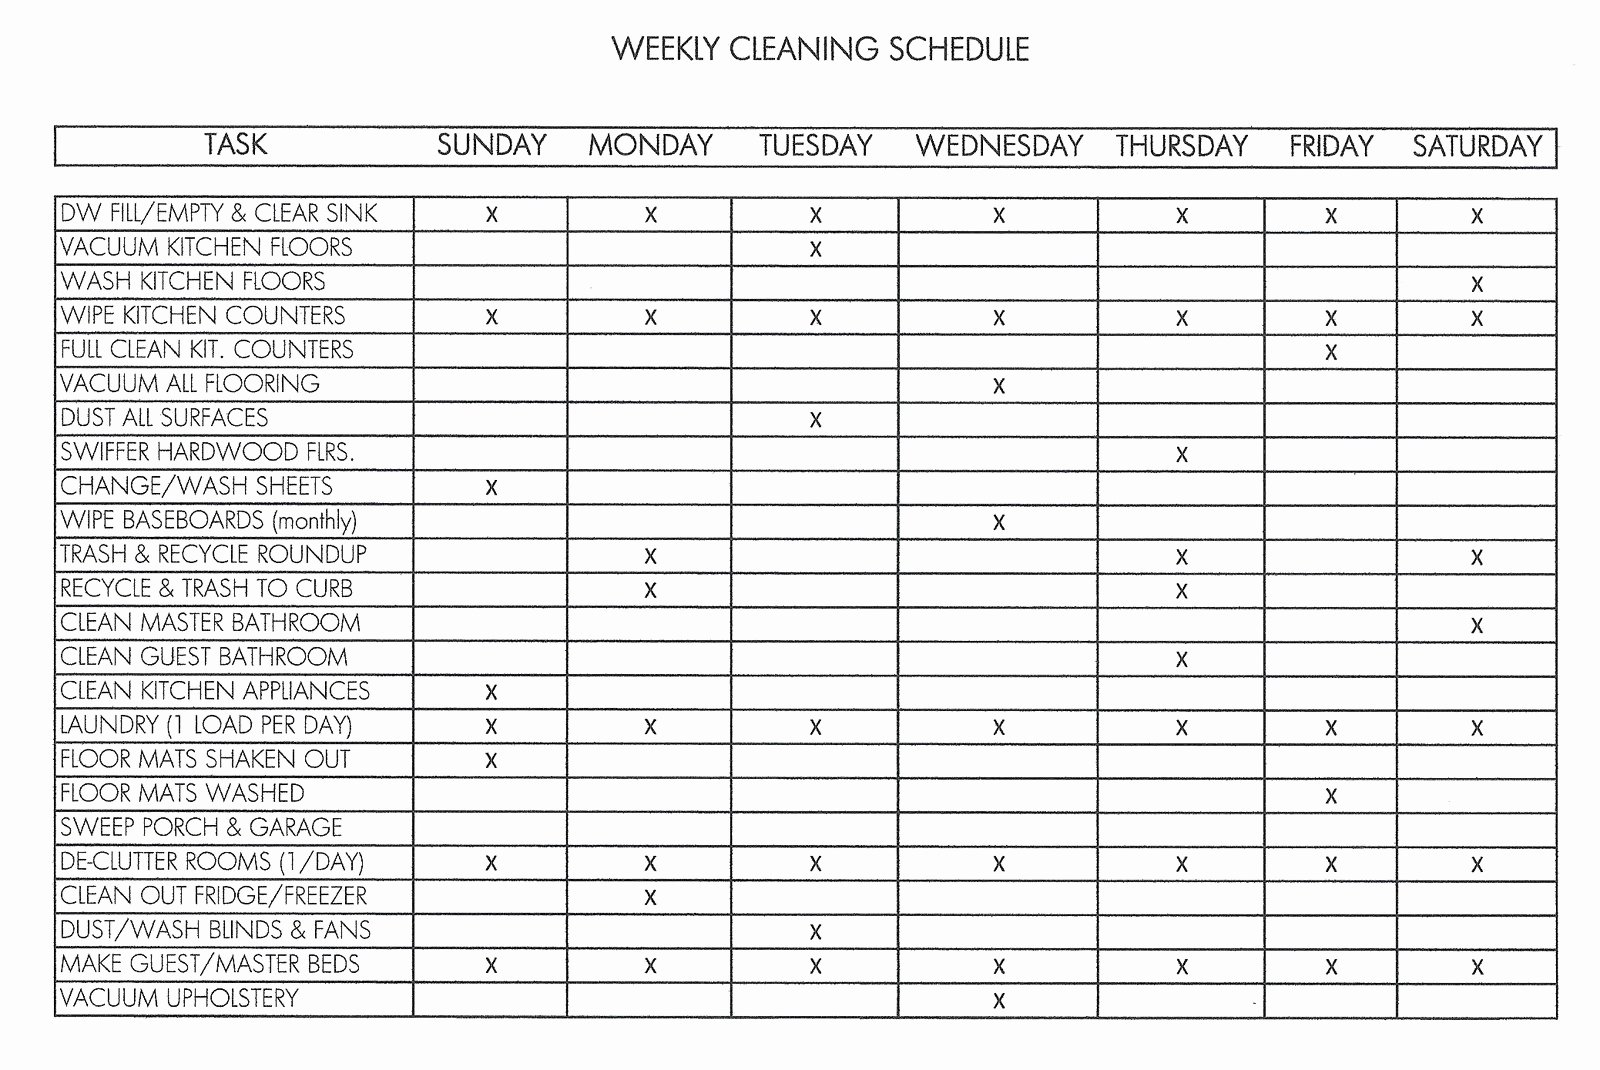 Weekly Cleaning Schedule Template Elegant Personal House Cleaning Schedule Template Weekly V M D